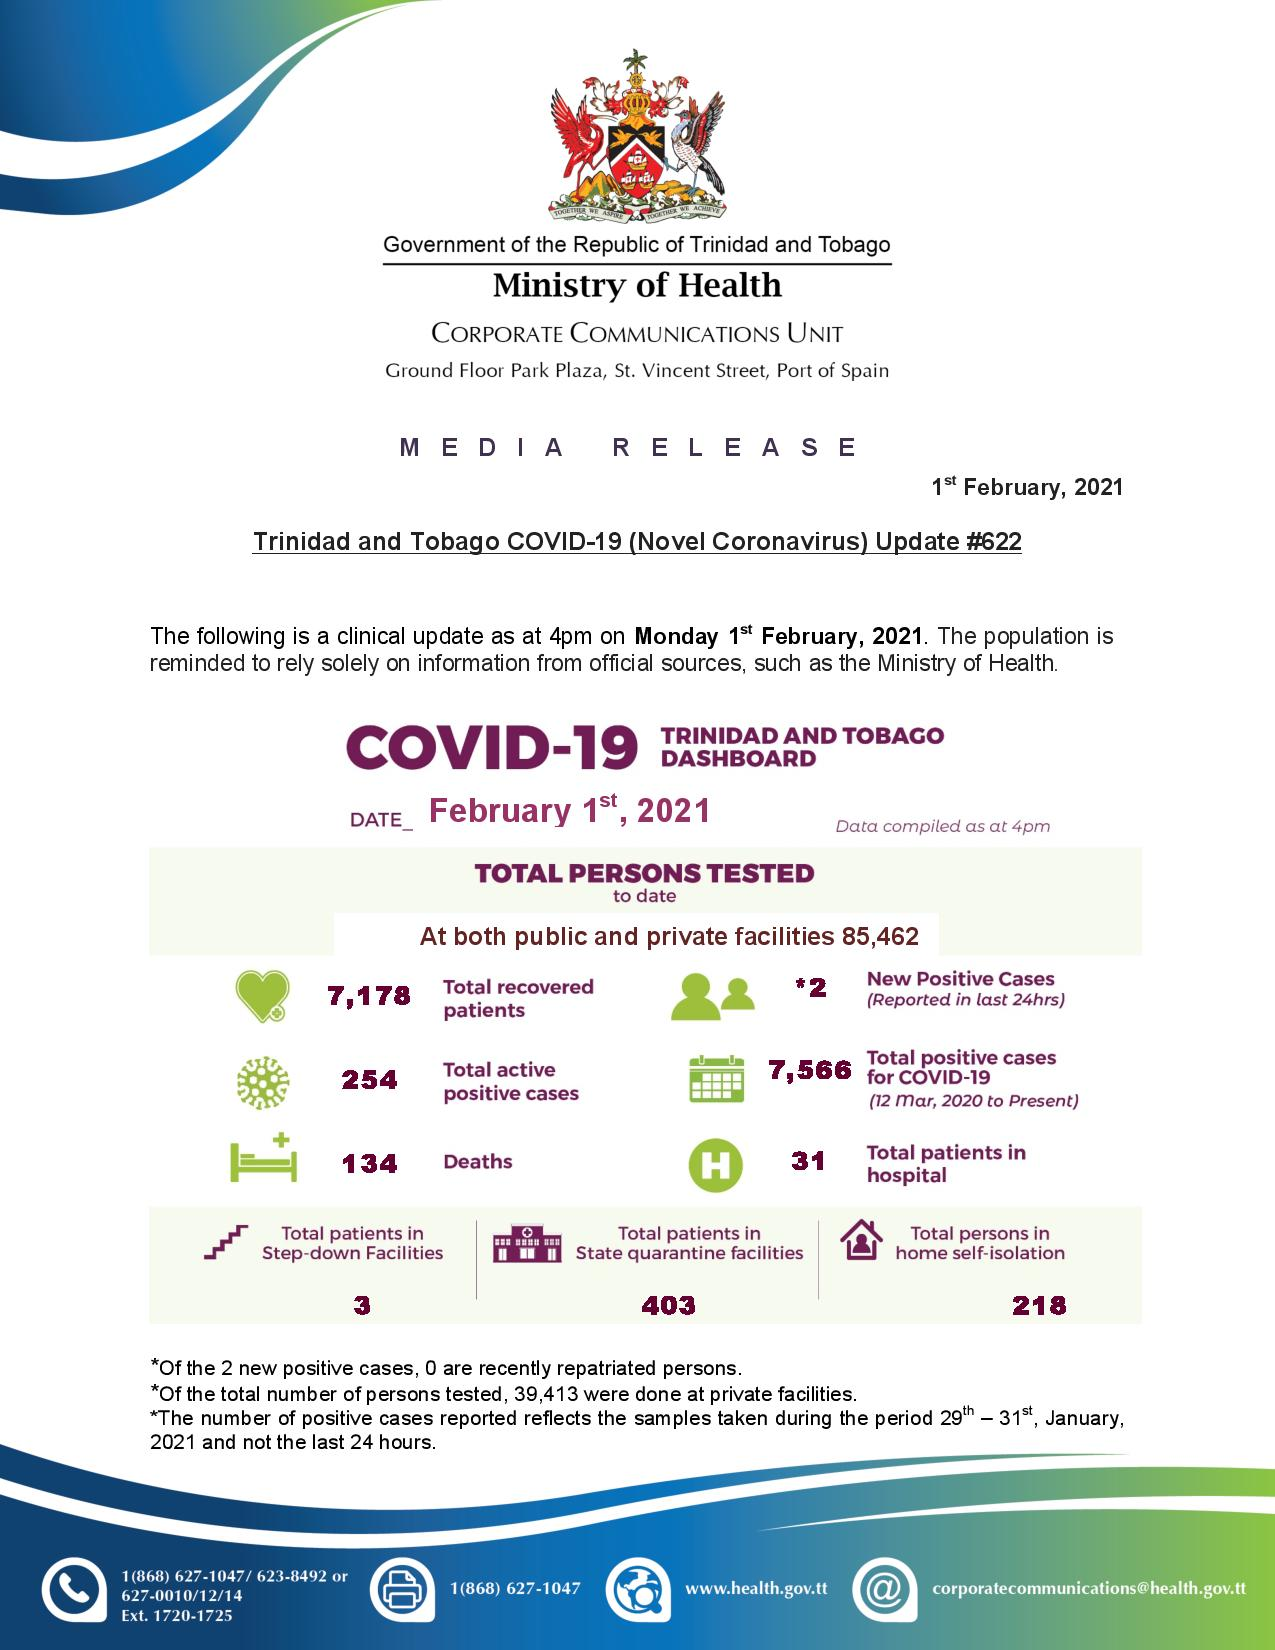 COVID-19 UPDATE - Monday 1st February 2021